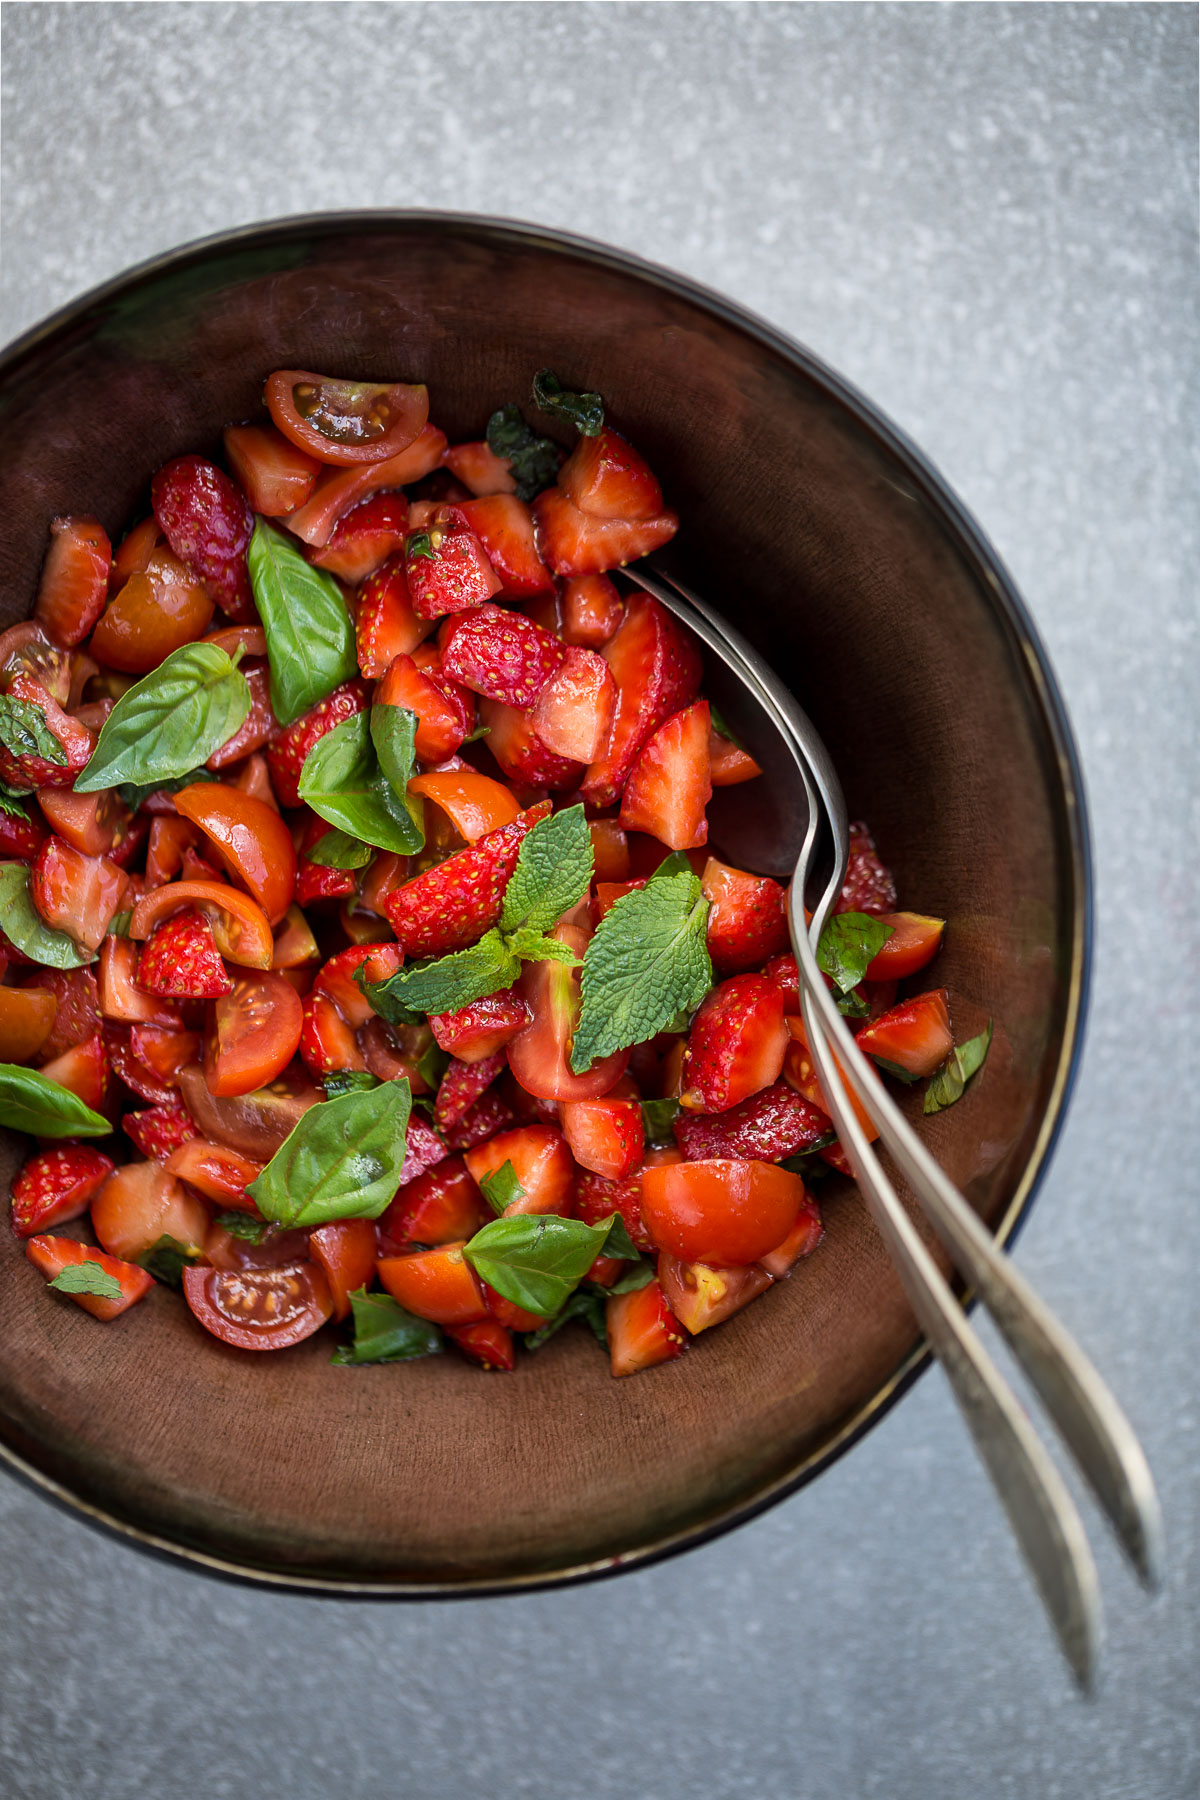 STRAWBERRY TOMATO BALSAMIC BRUSCHETTA with ricotta cheese #glutenfree -bruschette FRAGOLE e POMODORINI all'aceto balsamico #vegan #senzaglutine con ricotta #glutenfree #strawberry #tomato #balsamic #bruschetta